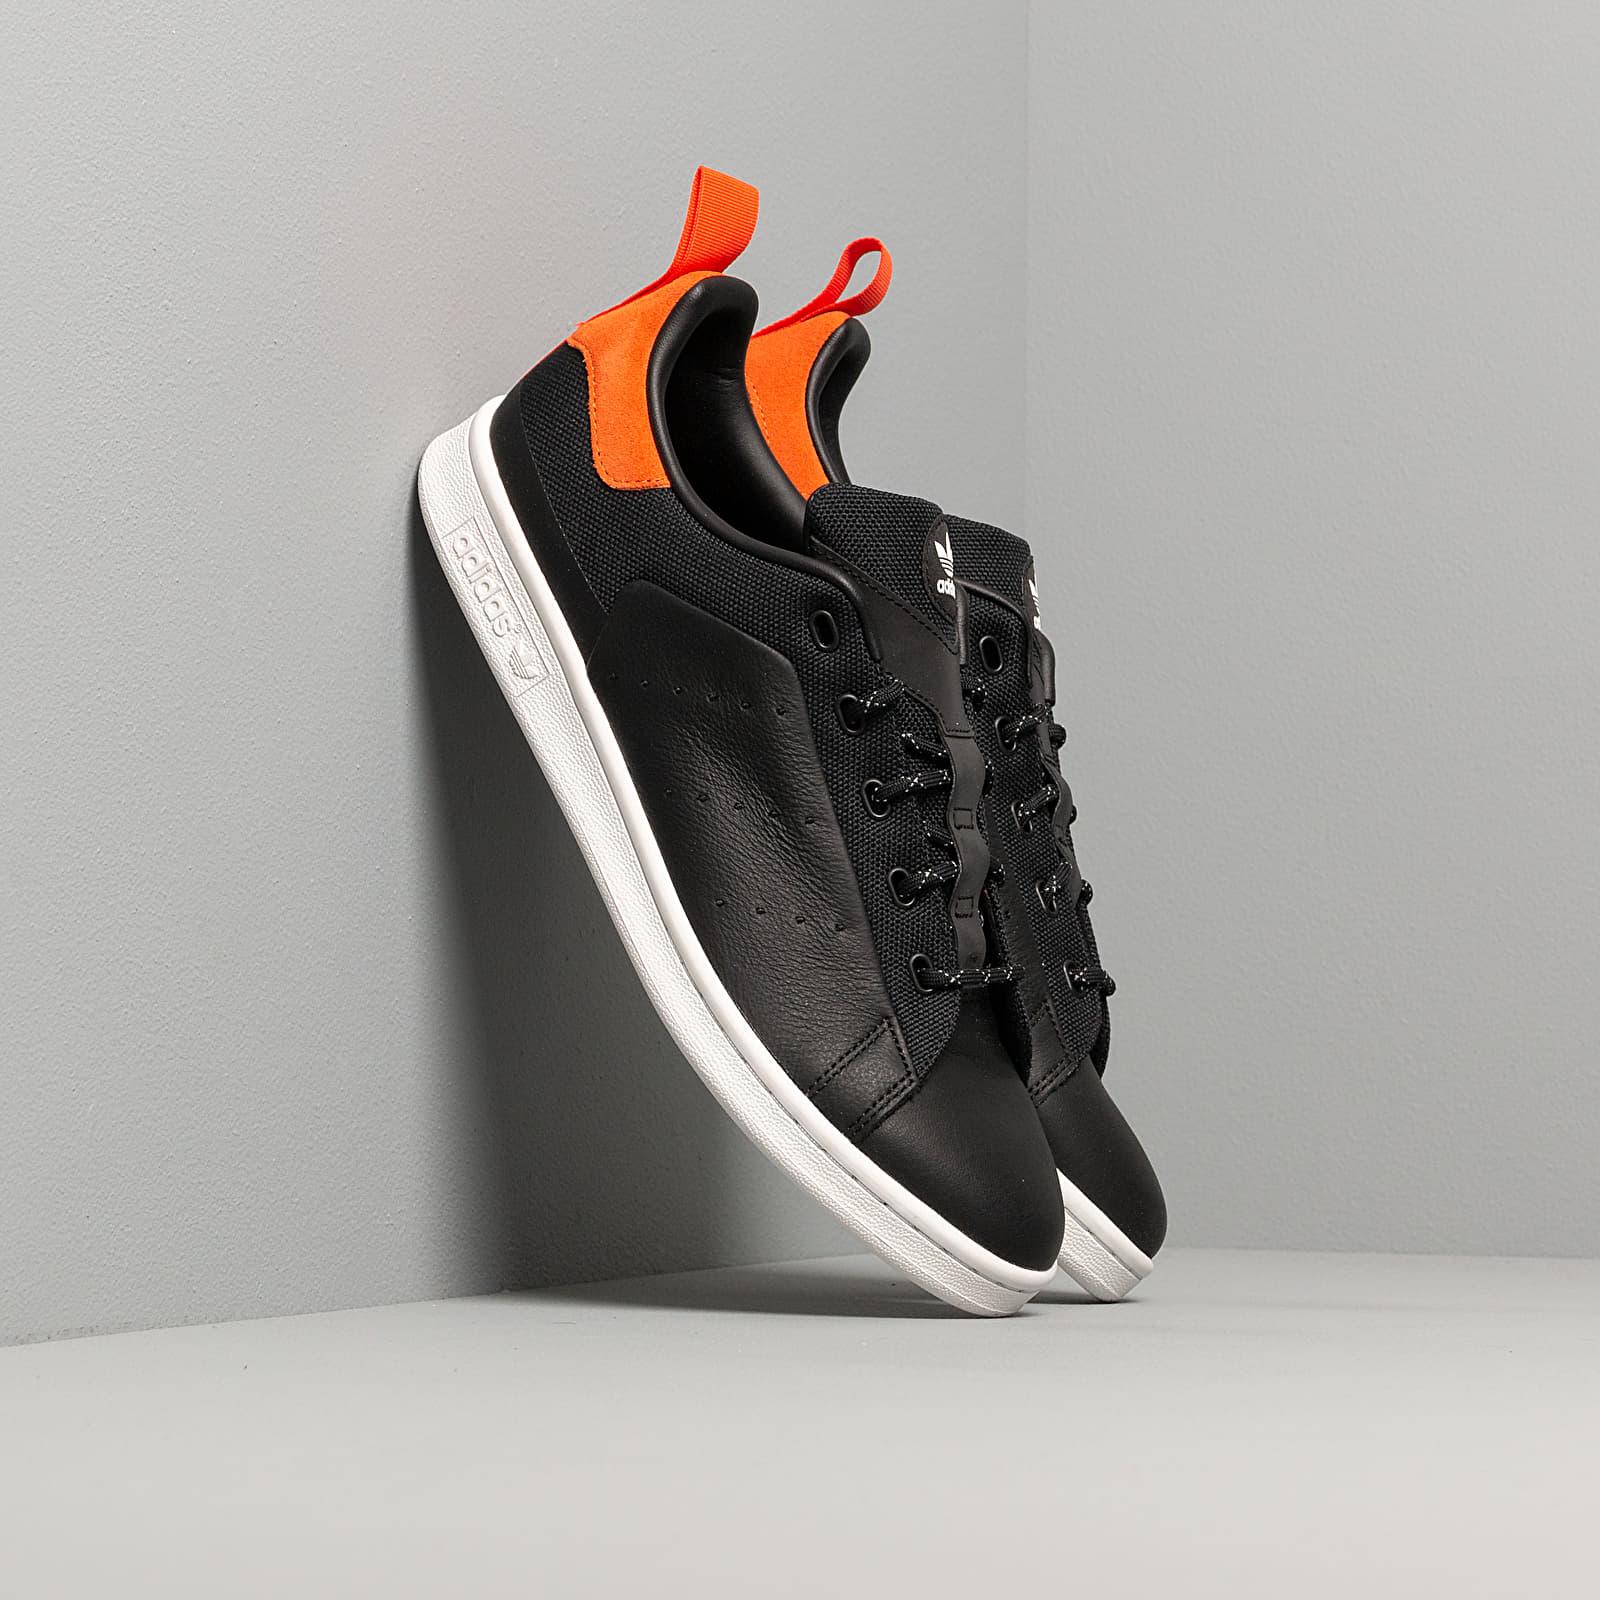 Chaussures et baskets homme adidas Stan Smith Core Black/ Core Black/ Off White